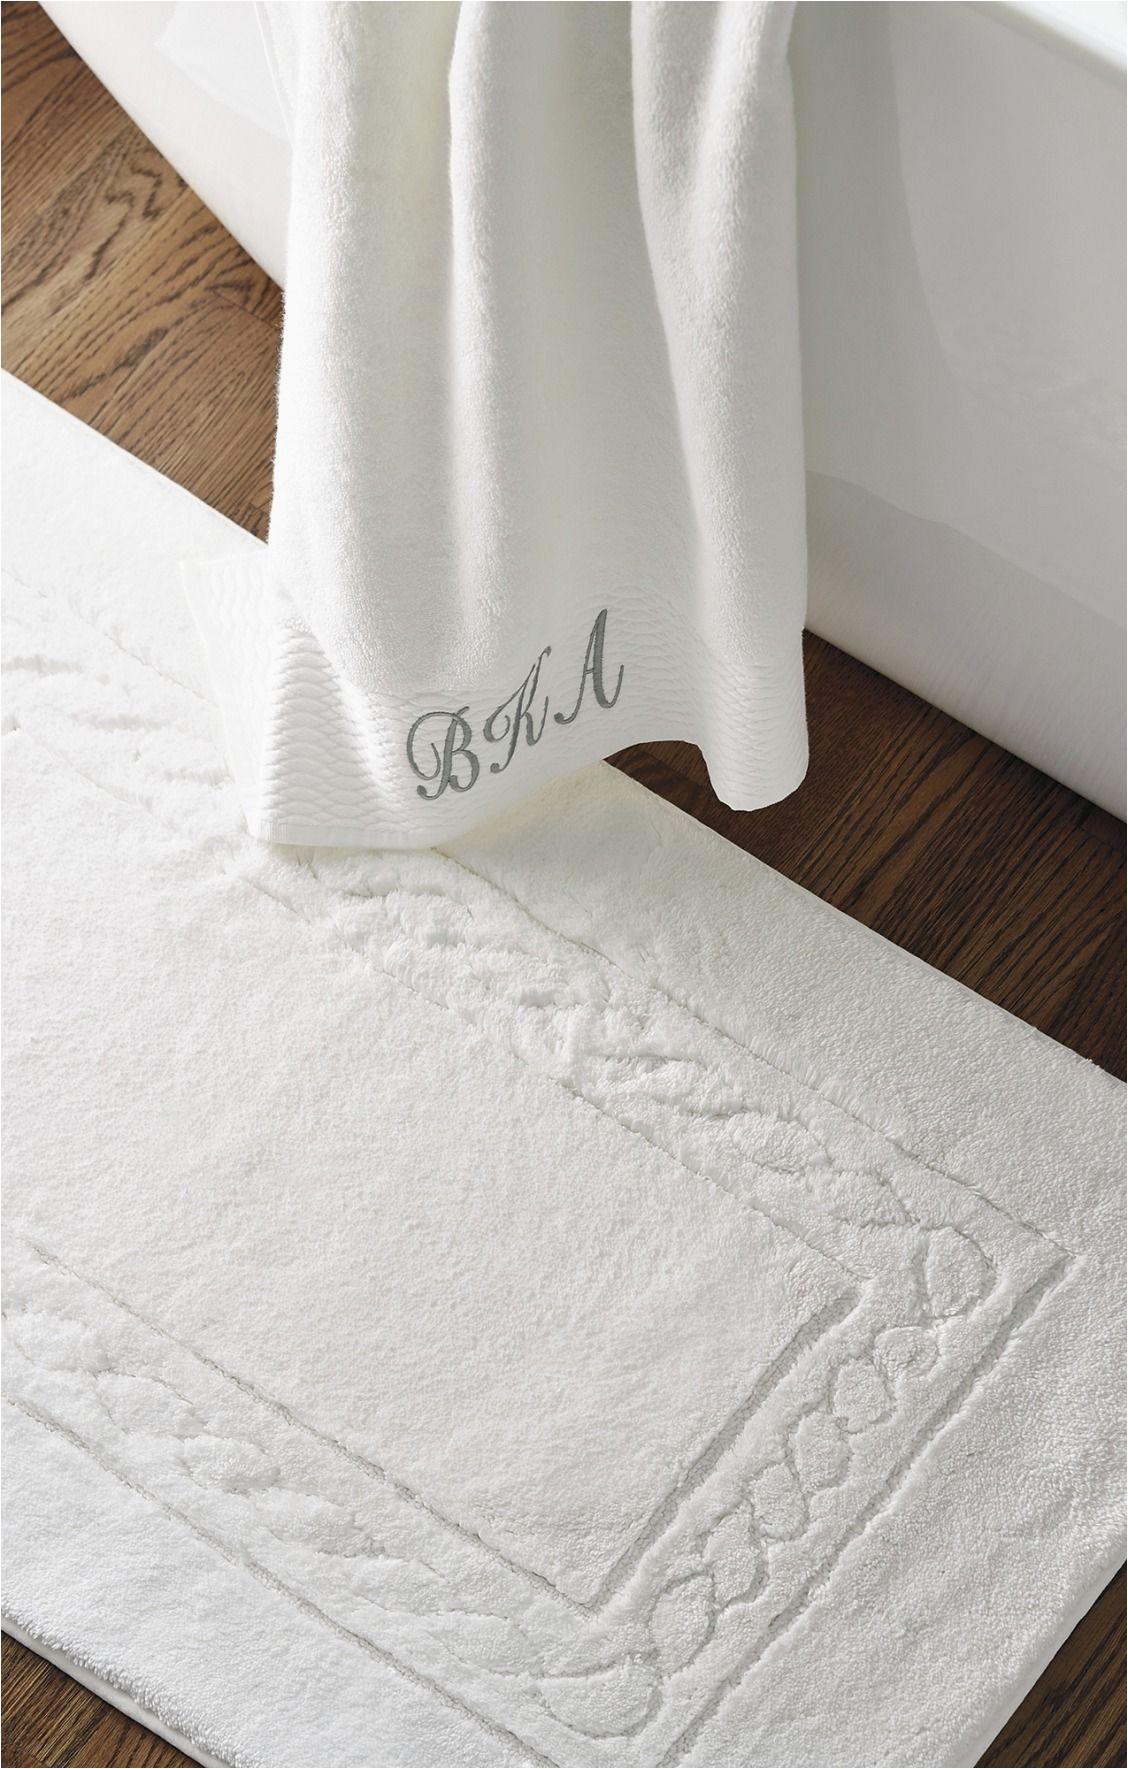 White Cotton Bathroom Rugs Egyptian Cotton Skid Resistant Bath Rug